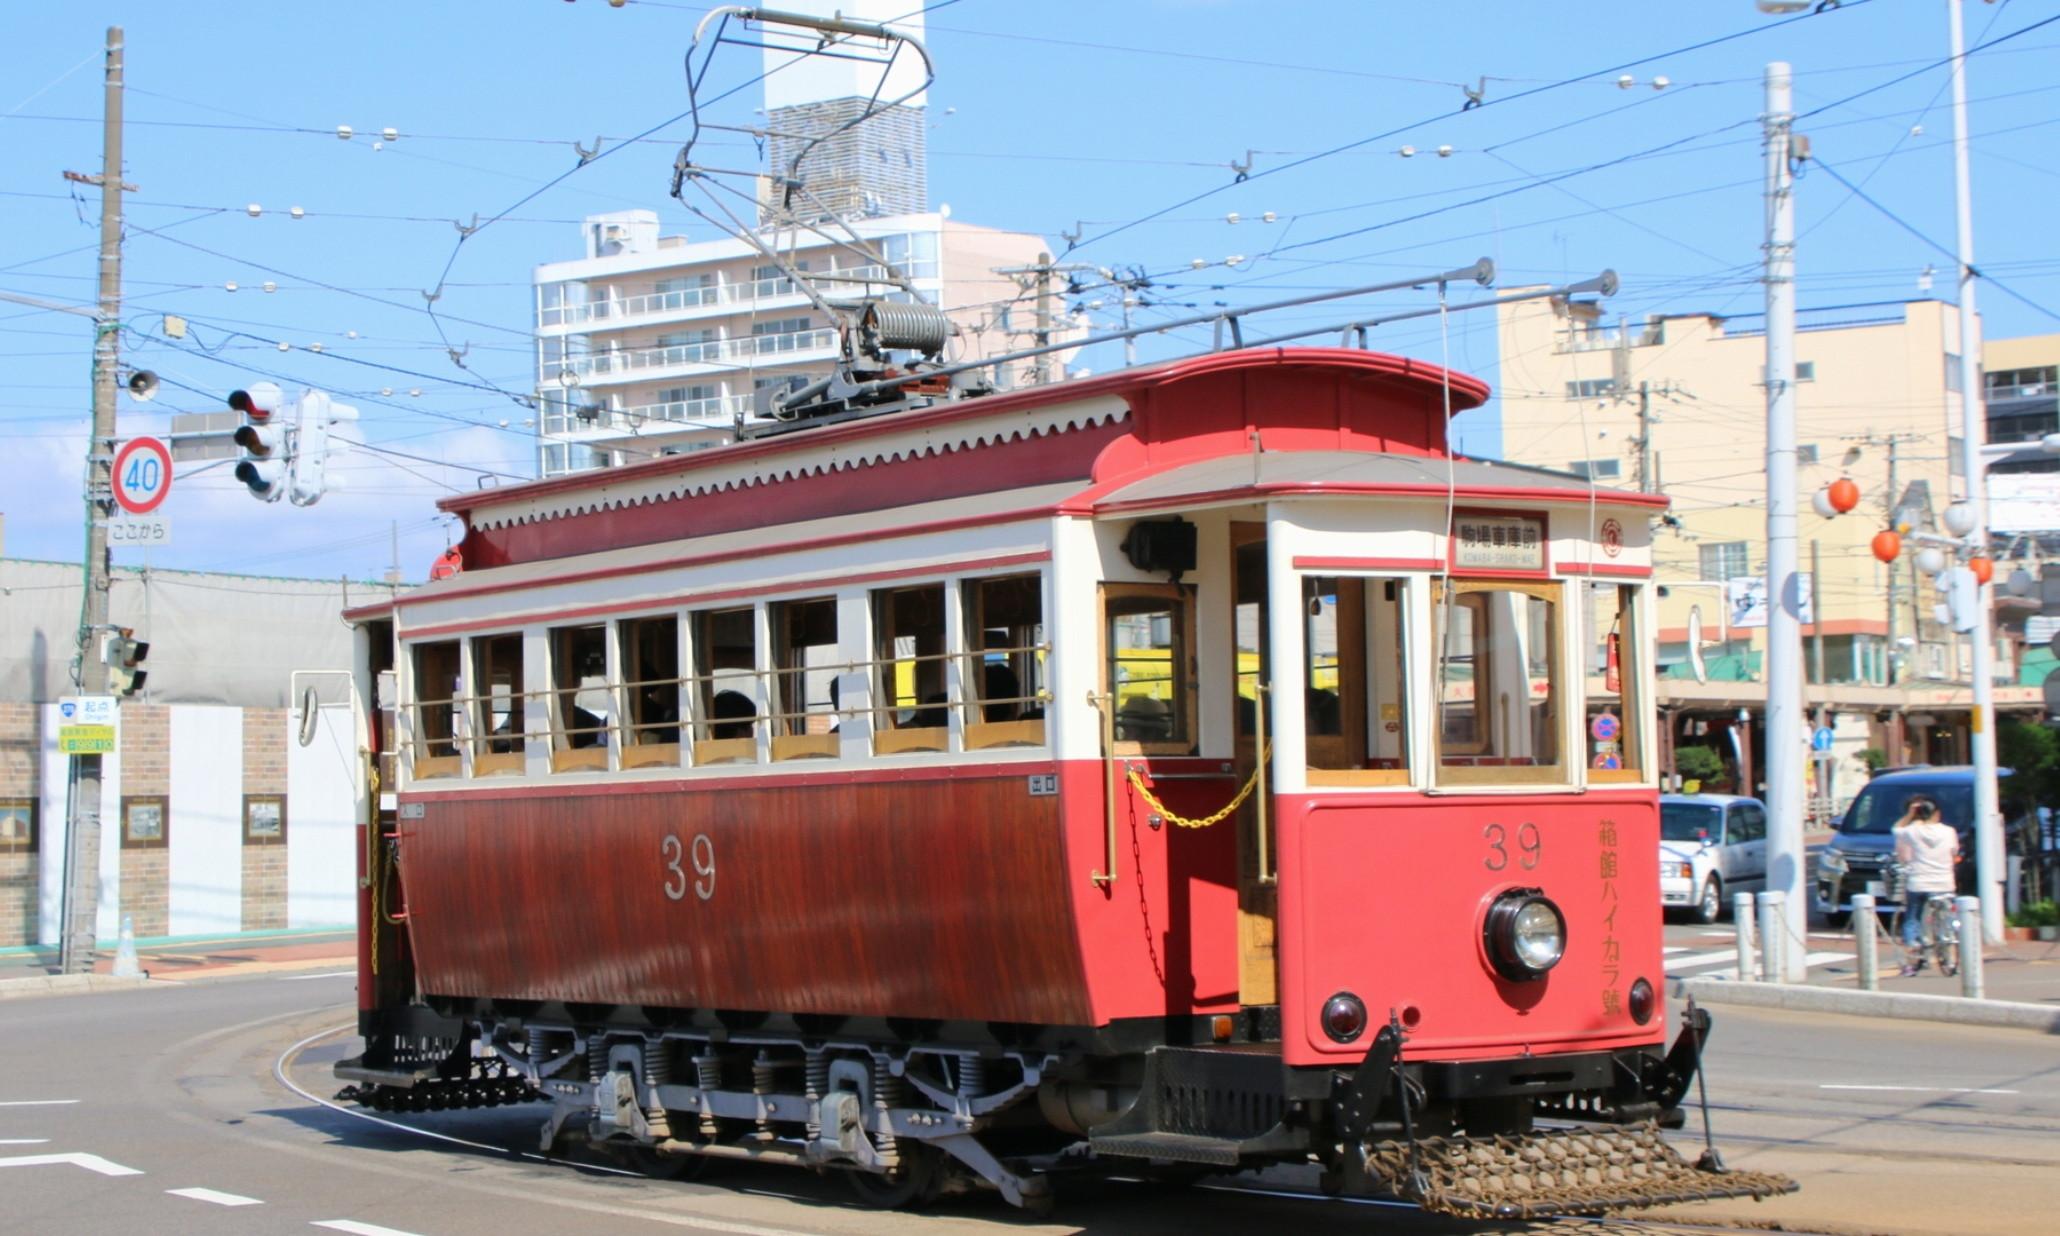 Hakodate_Tram_Hakodate_Haikara(30_Series)